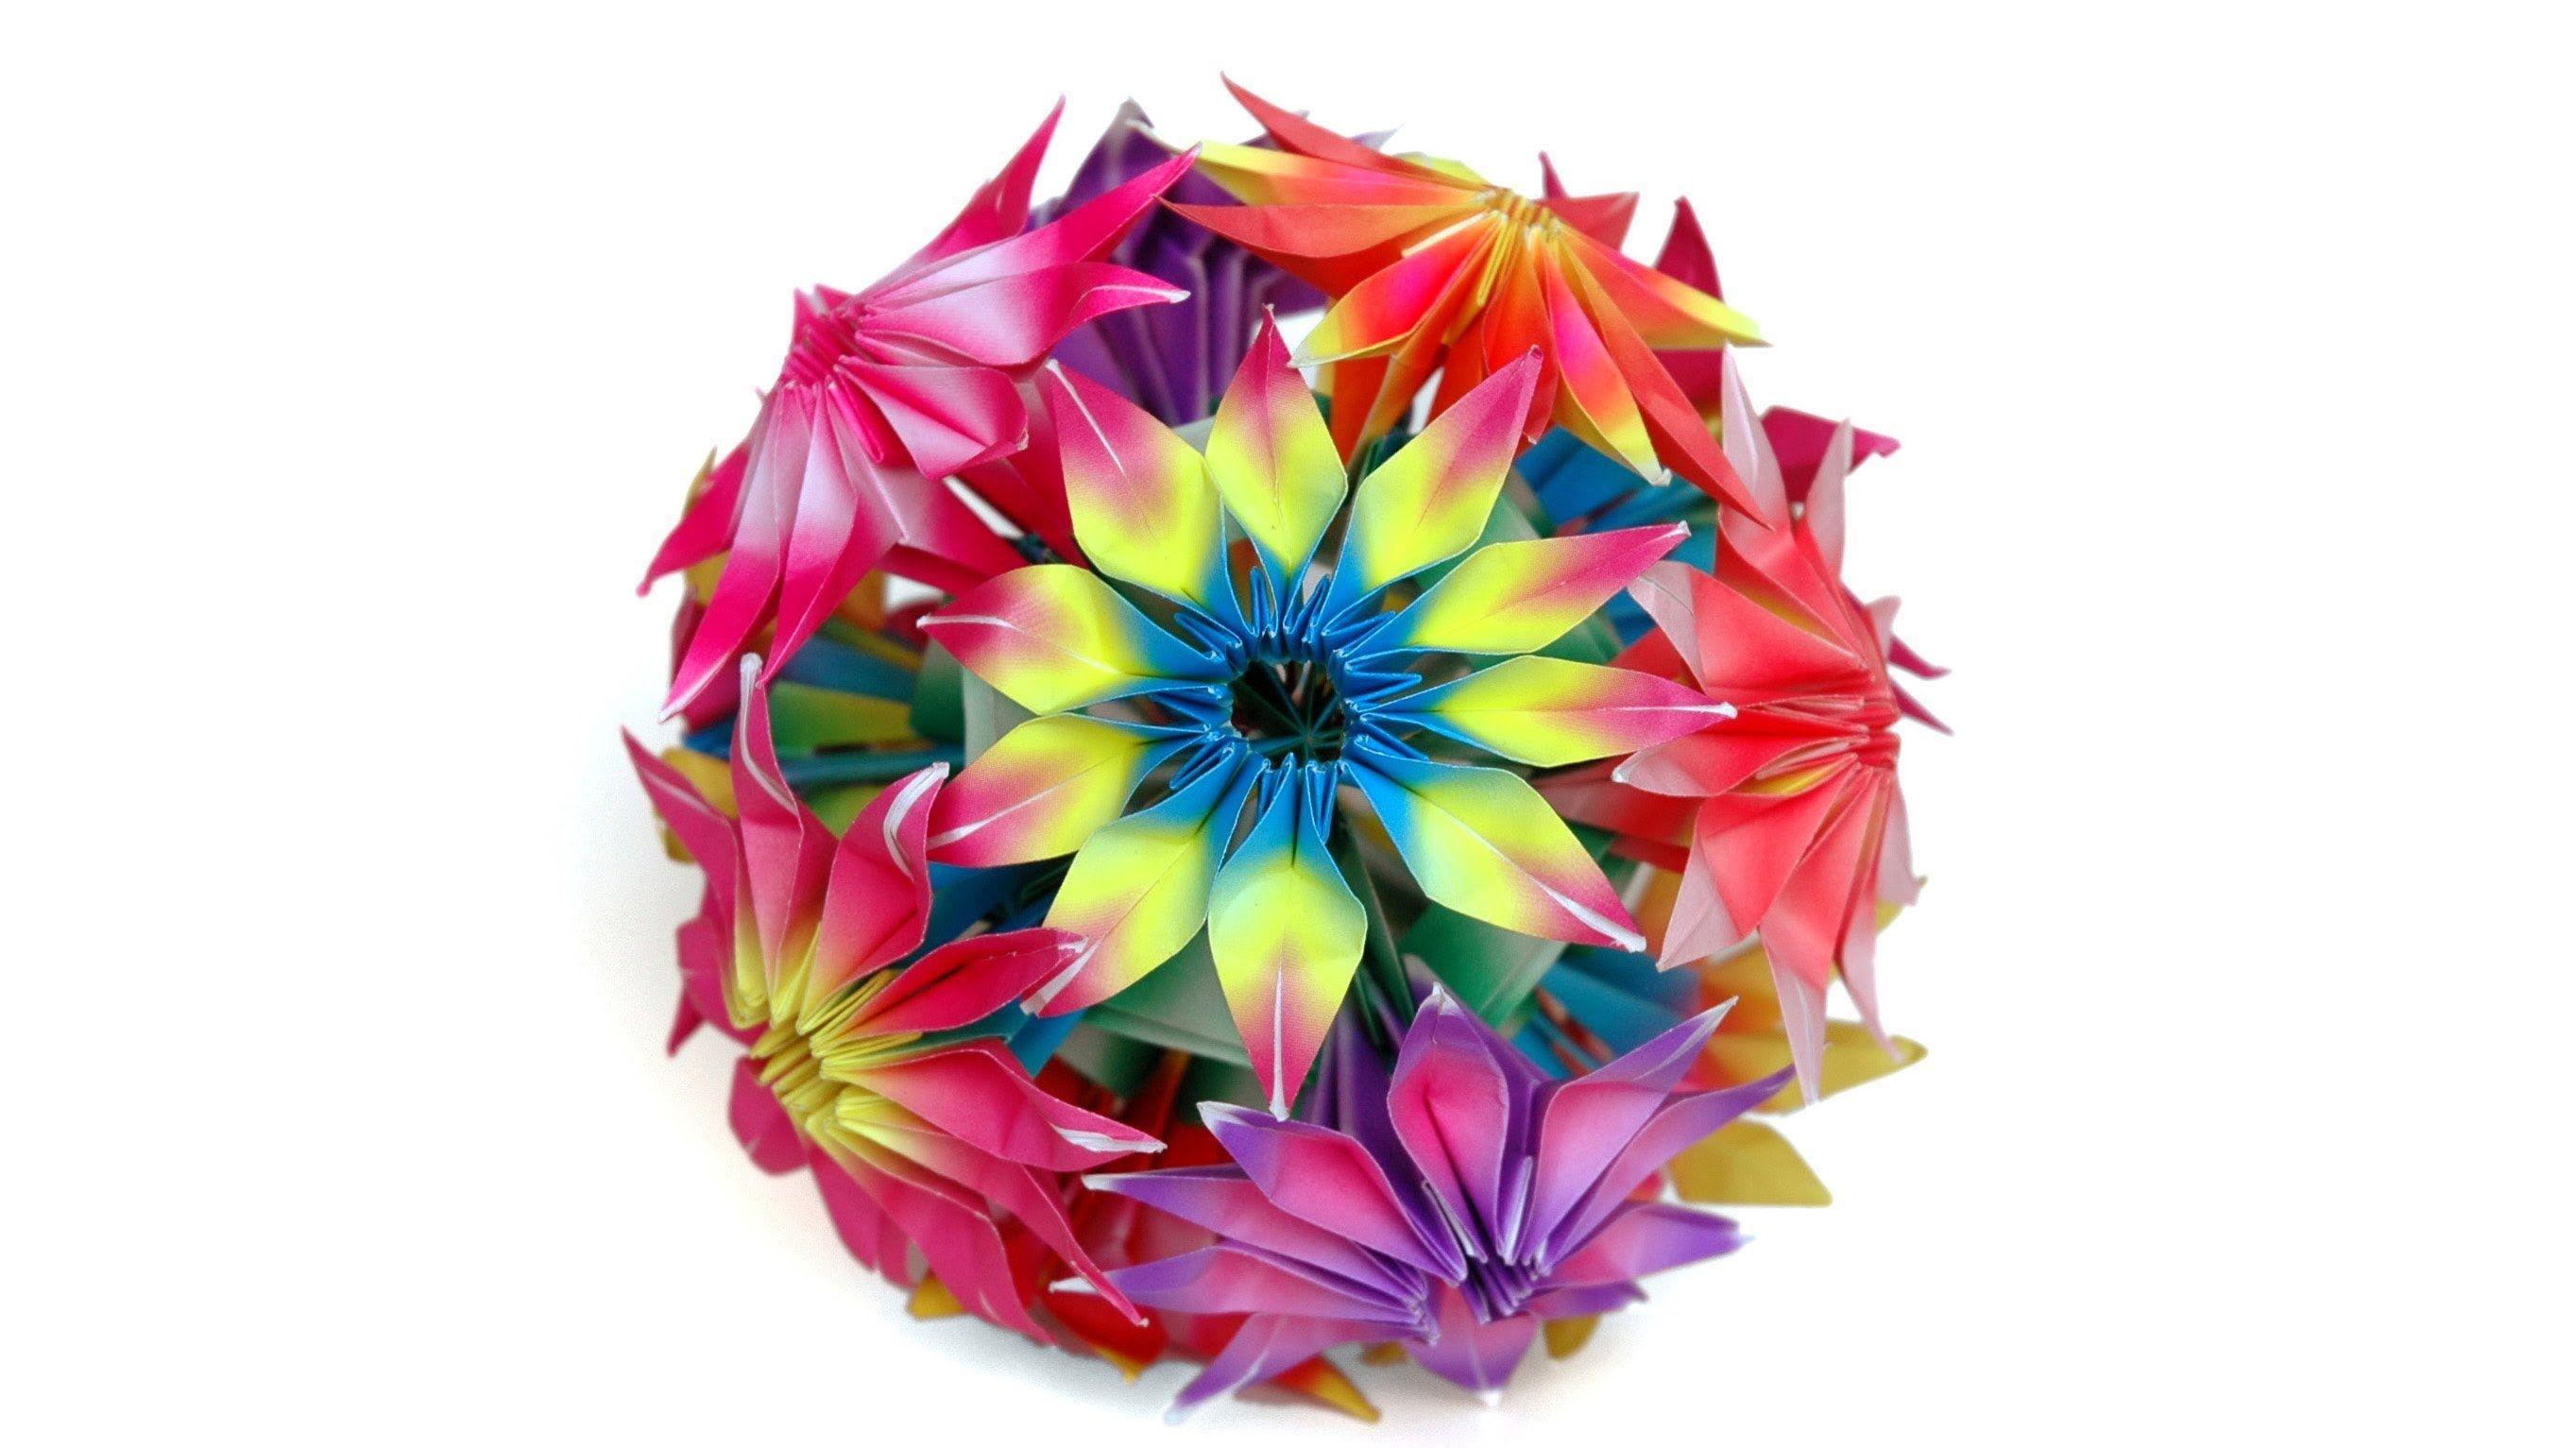 Tutorial How To Make Gloriosa Modular Origami Flowers And Flower